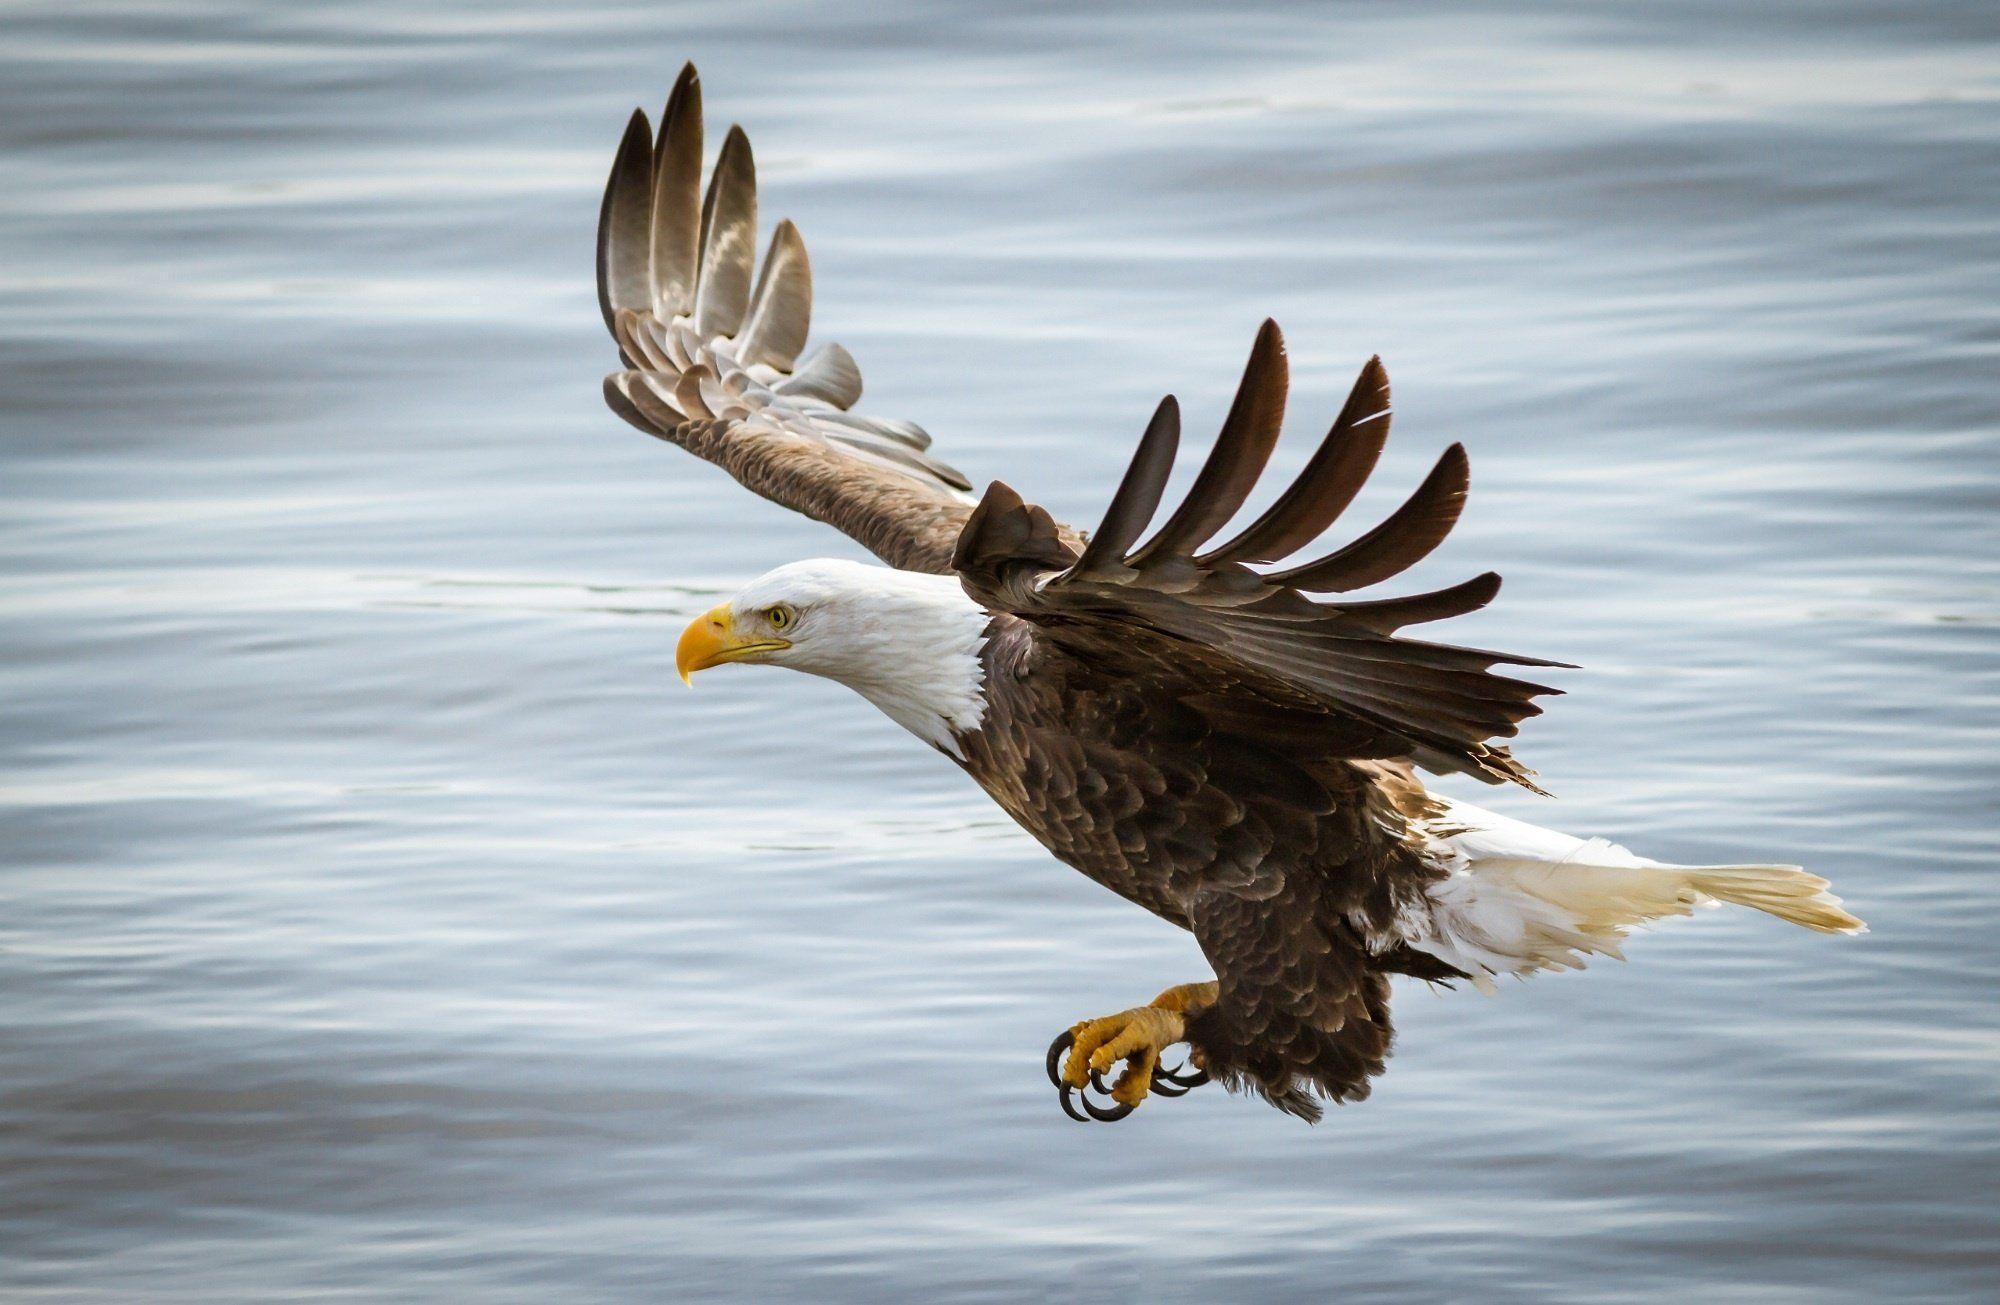 Eagle bird predator wings flight wallpaper 2000x1305 309694 eagle bird predator wings flight wallpaper 2000x1305 309694 wallpaperup voltagebd Image collections